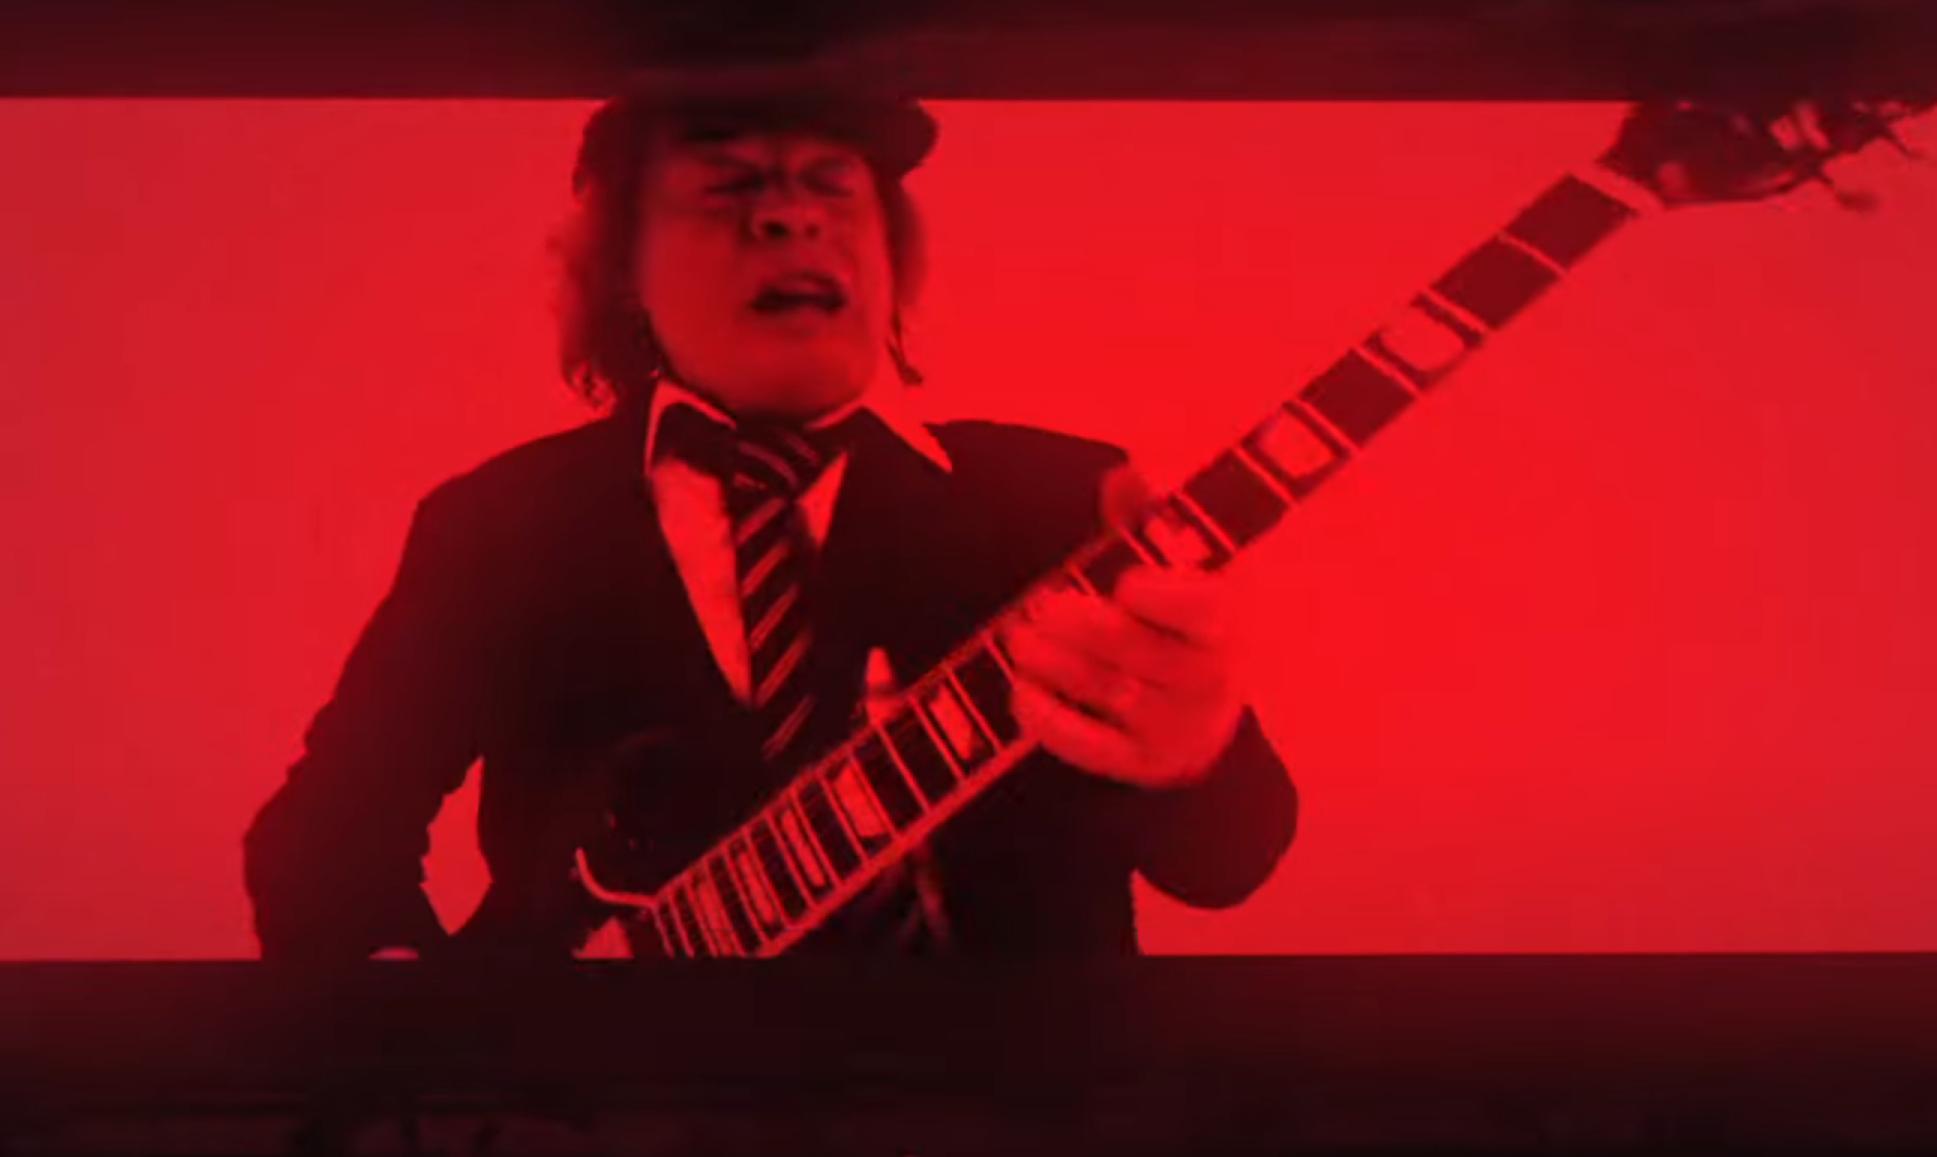 AC/DC Demon Fire video